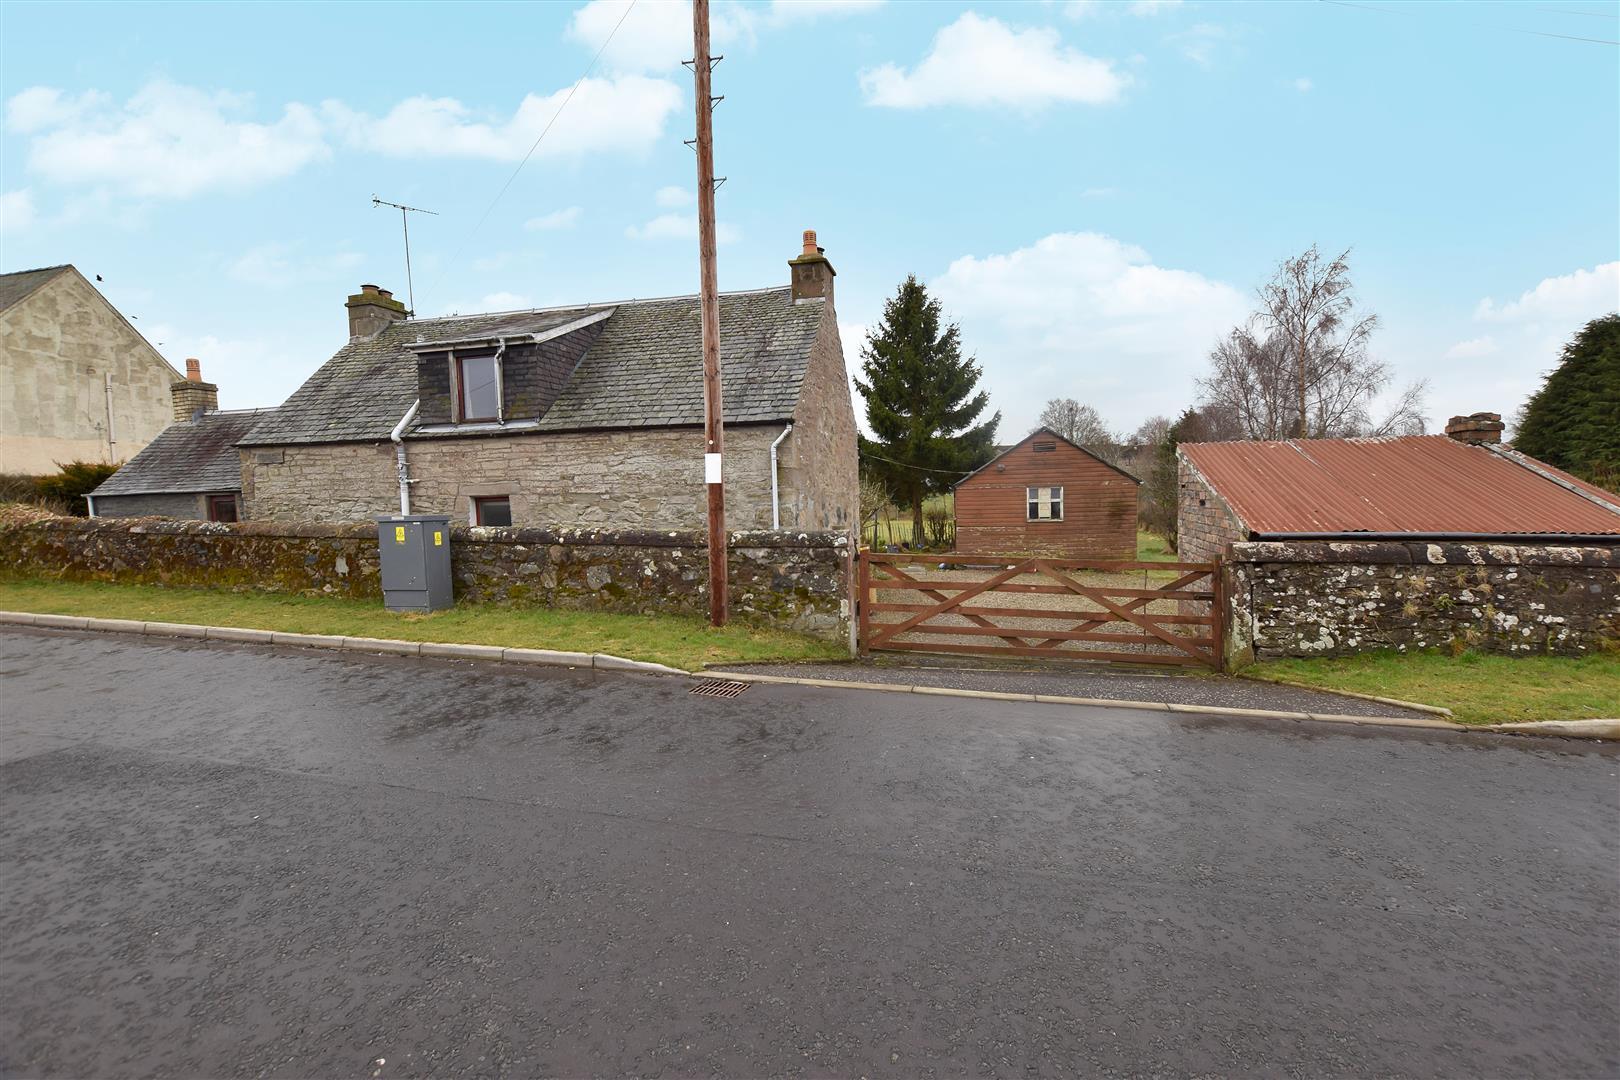 Burnside Road, Balbeggie, Balbeggie, Perthshire, PH2 6HD, UK